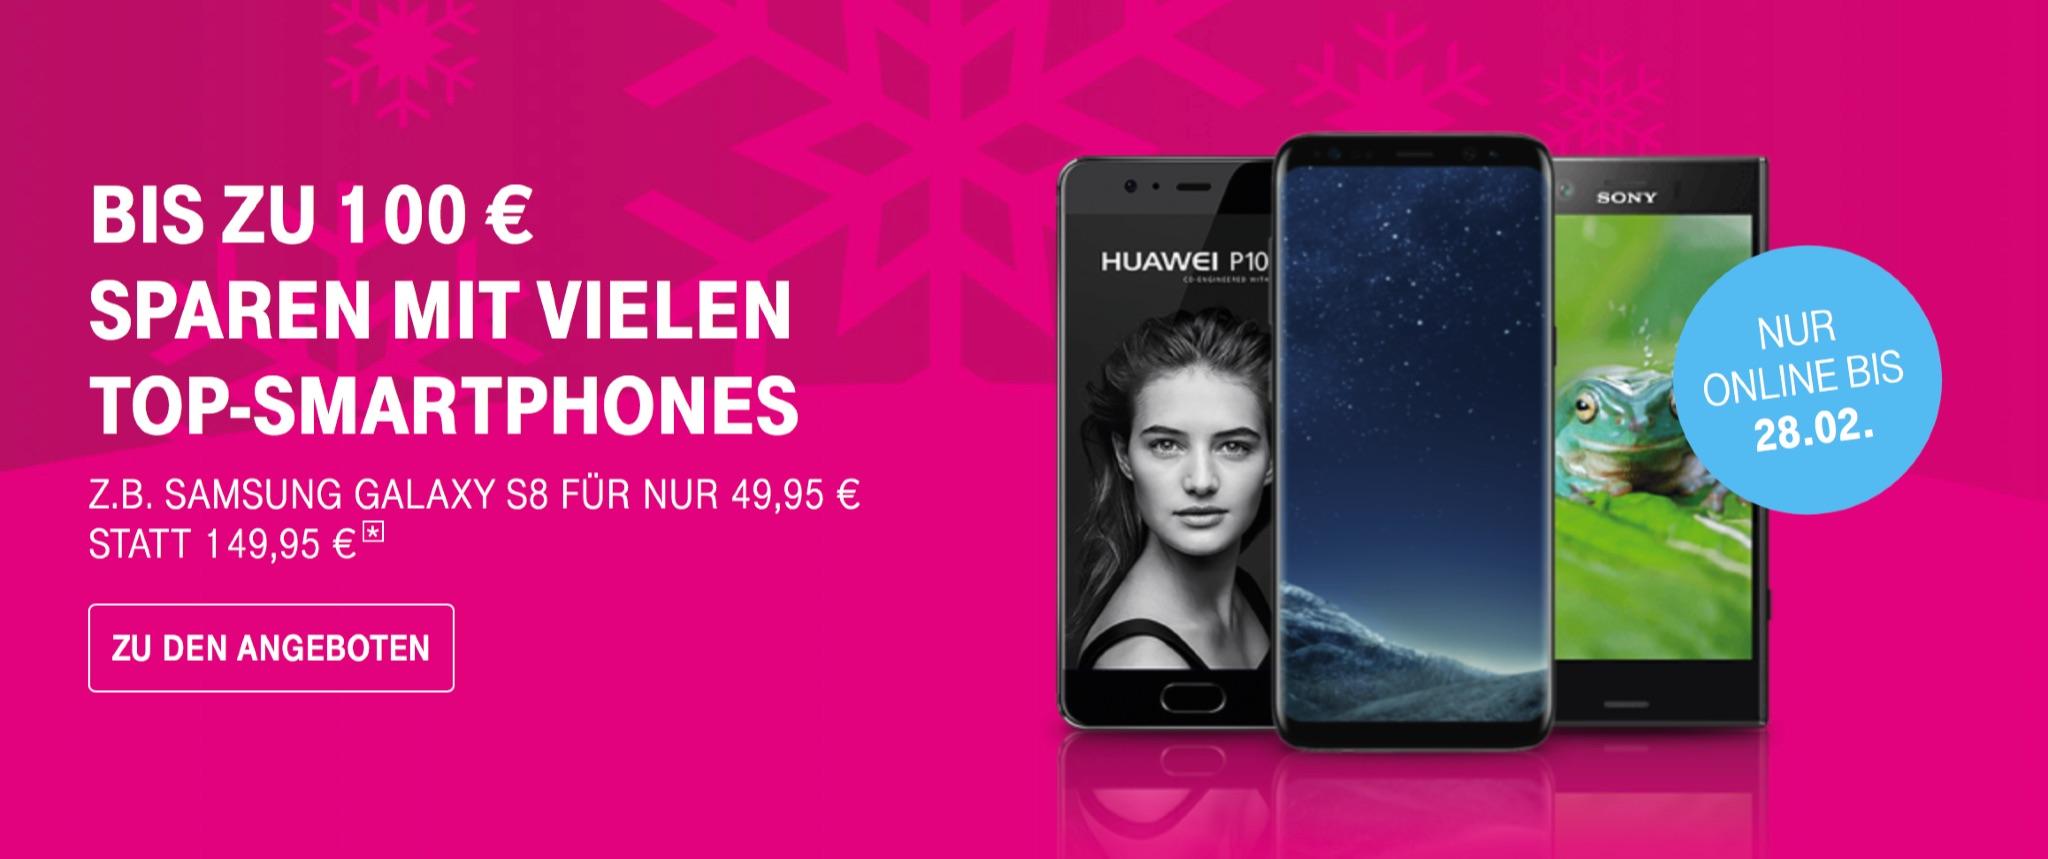 telekom aktion bis zu 100 euro rabatt auf iphone 8 iphone 7 samsung galaxy s8 huawei mate 10. Black Bedroom Furniture Sets. Home Design Ideas